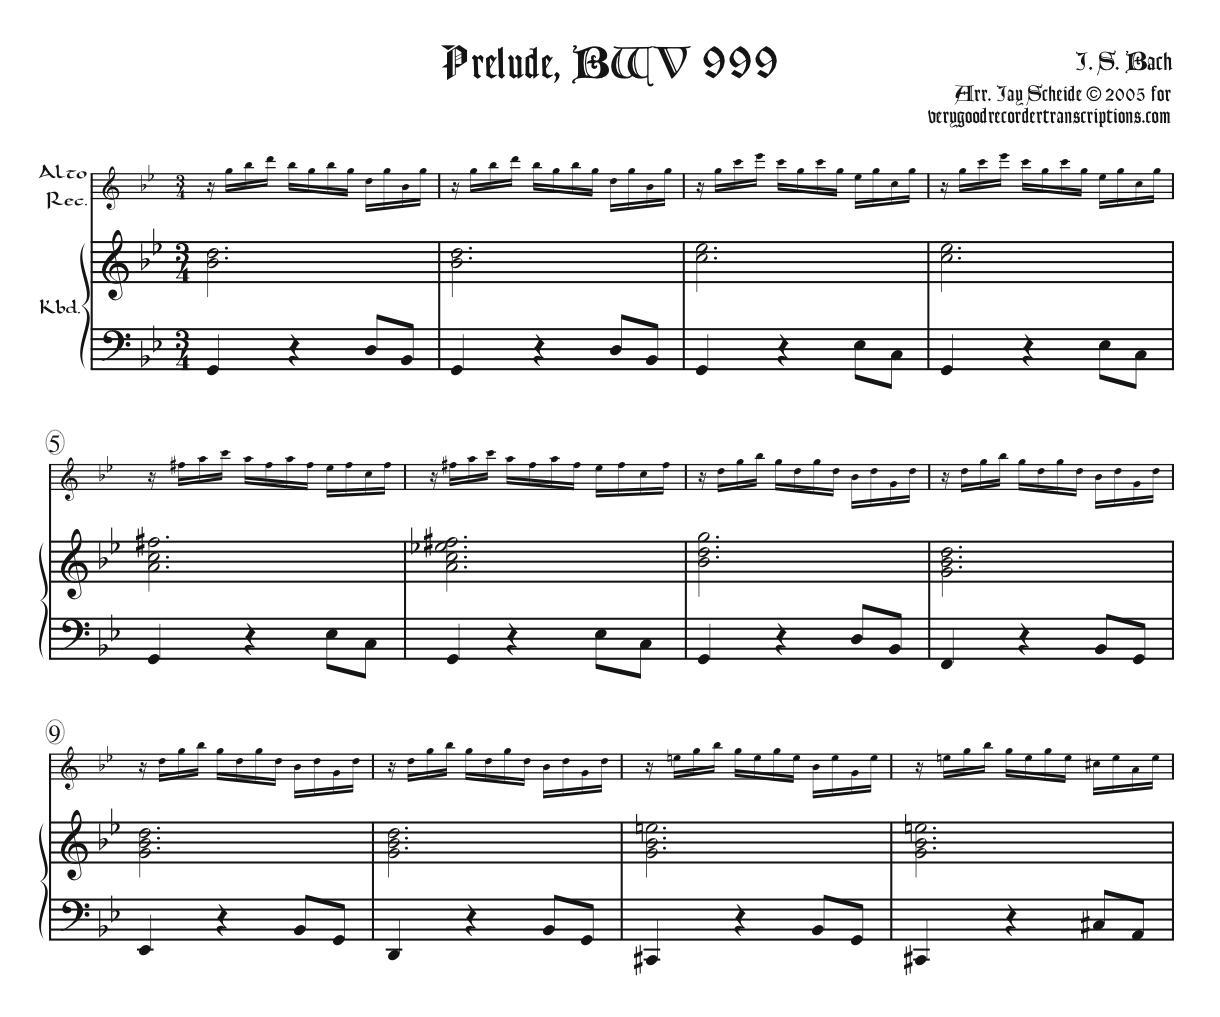 Prelude, BWV 999